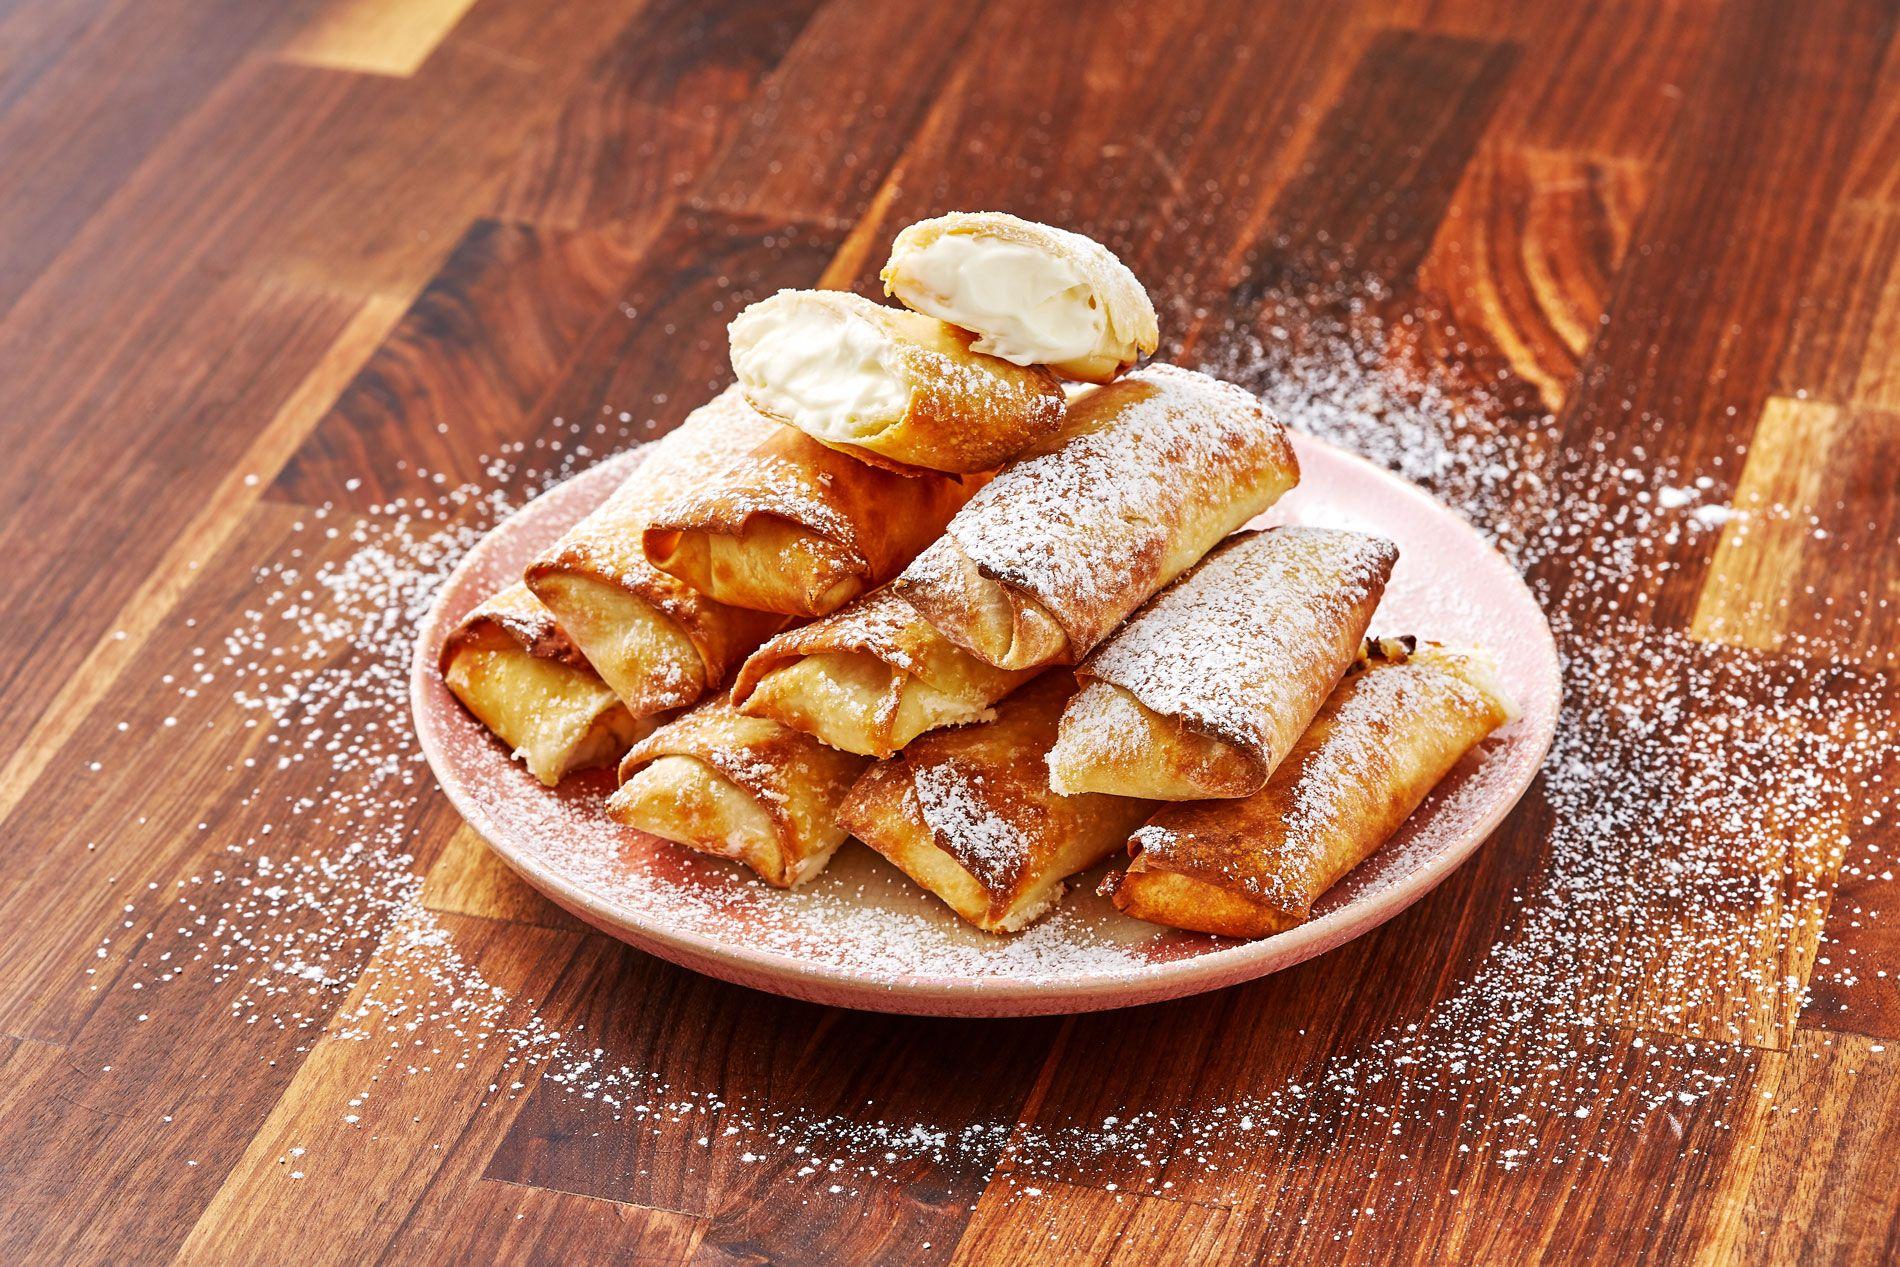 delish-190801-cheesecake-egg-rolls-0124-landscape-pf-1565977094.jpg